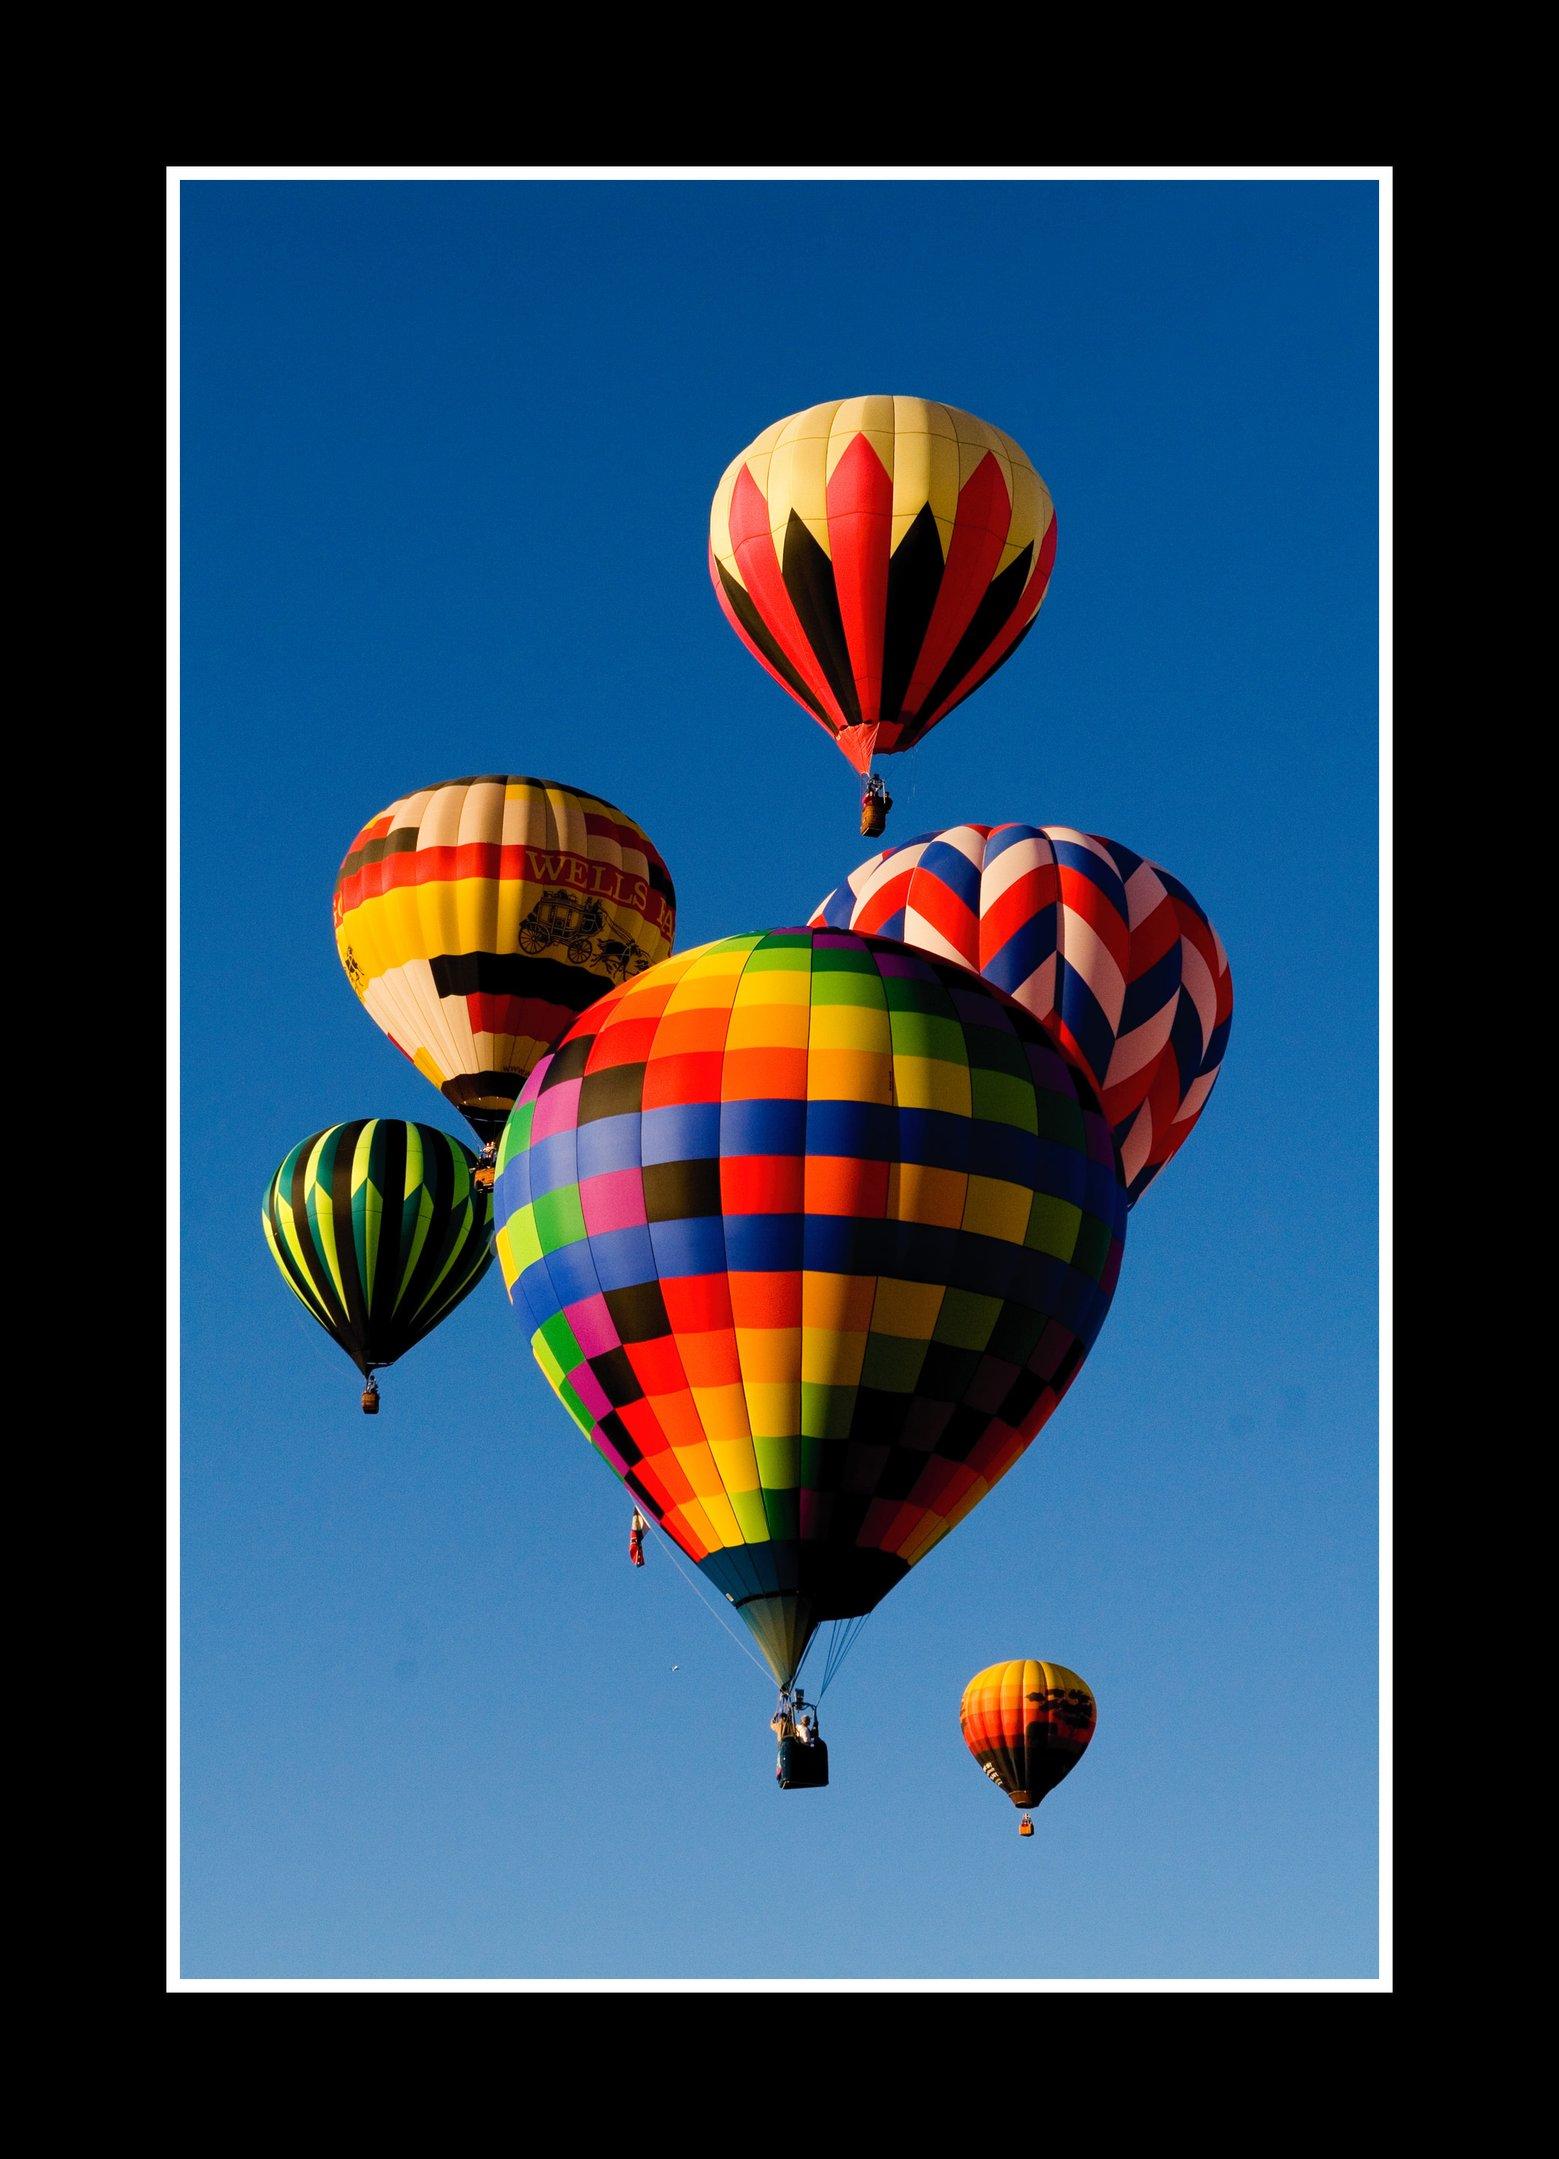 jpeg-albq-balloons-6126-web.jpg